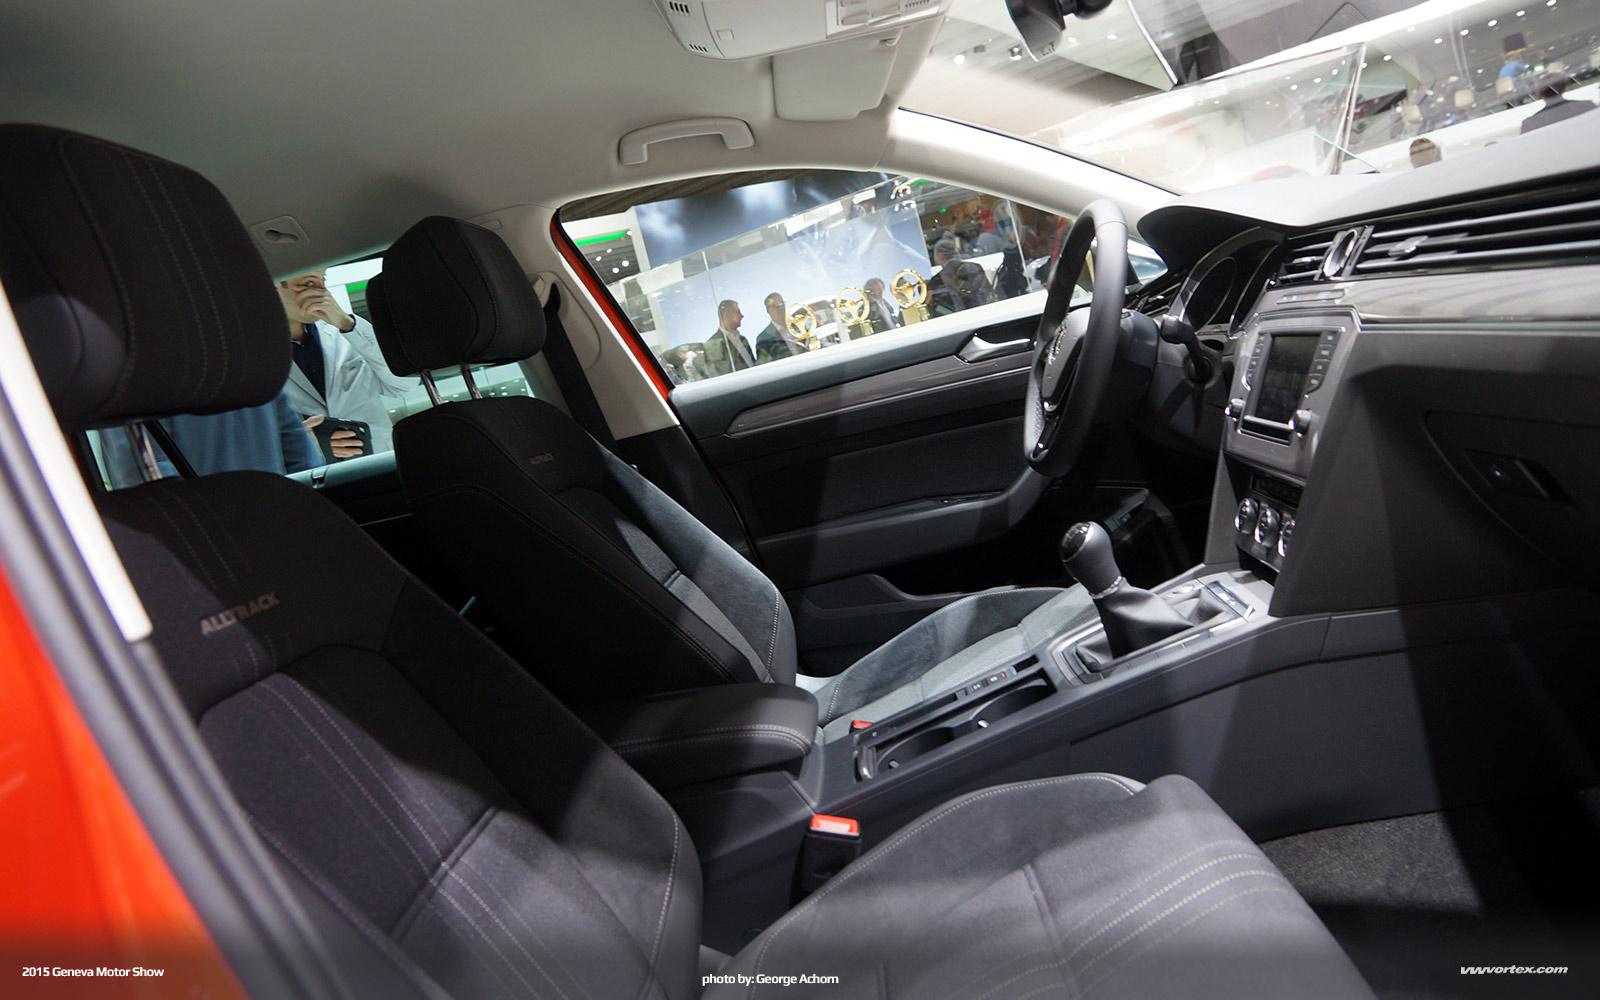 2015-Geneva-Motor-Show-4936